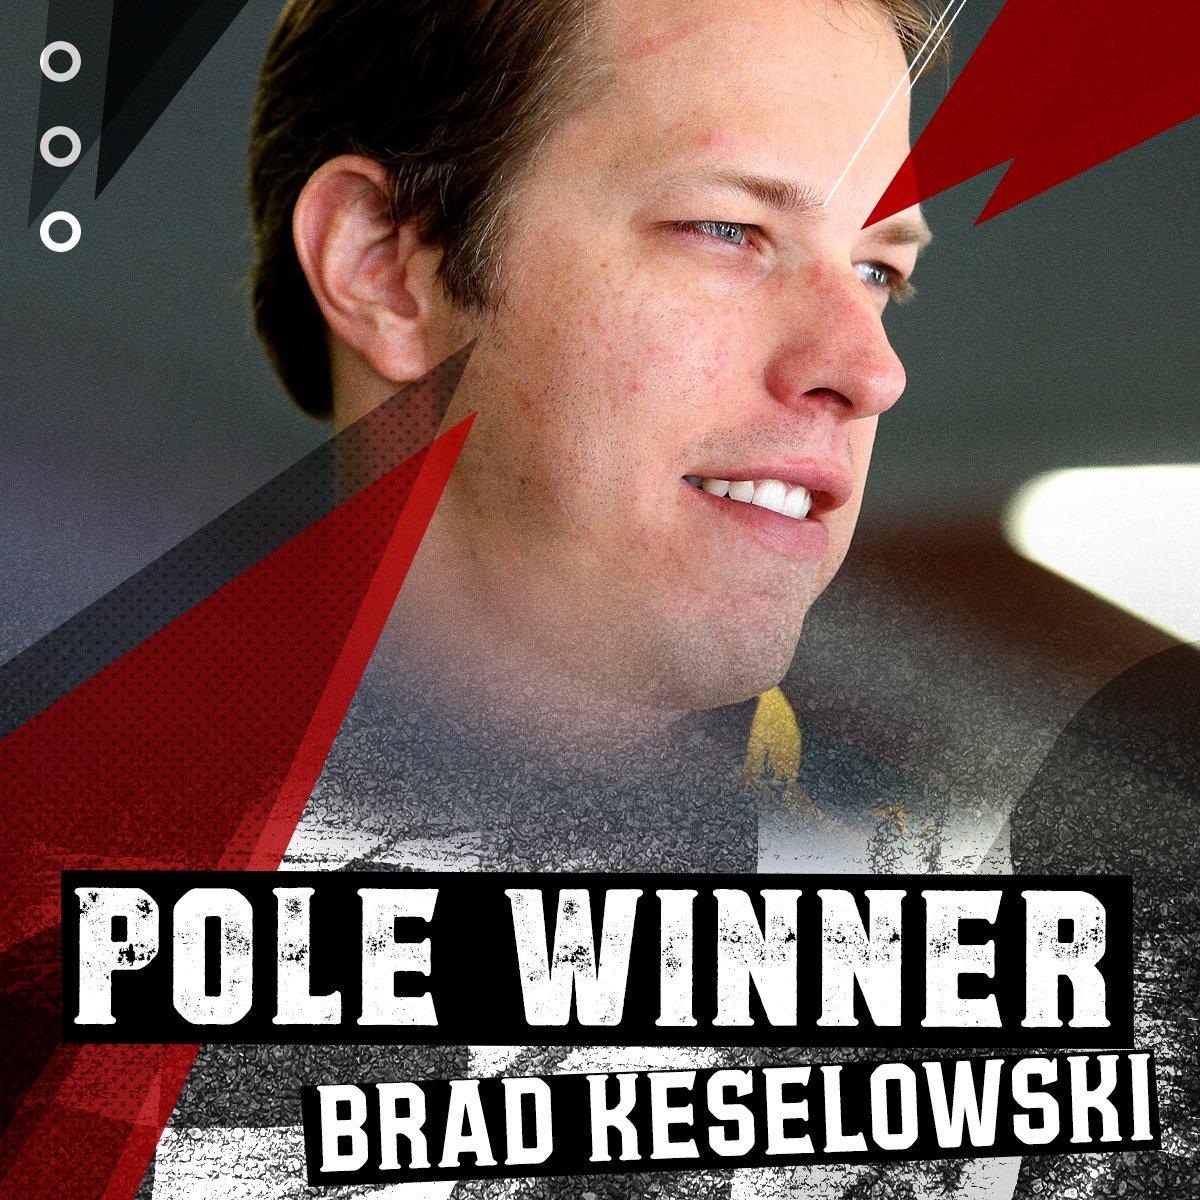 Brad @keselowski wins the pole for Sunday's @NASCAR Cup Series race at @NHMS!  @Team_Penske